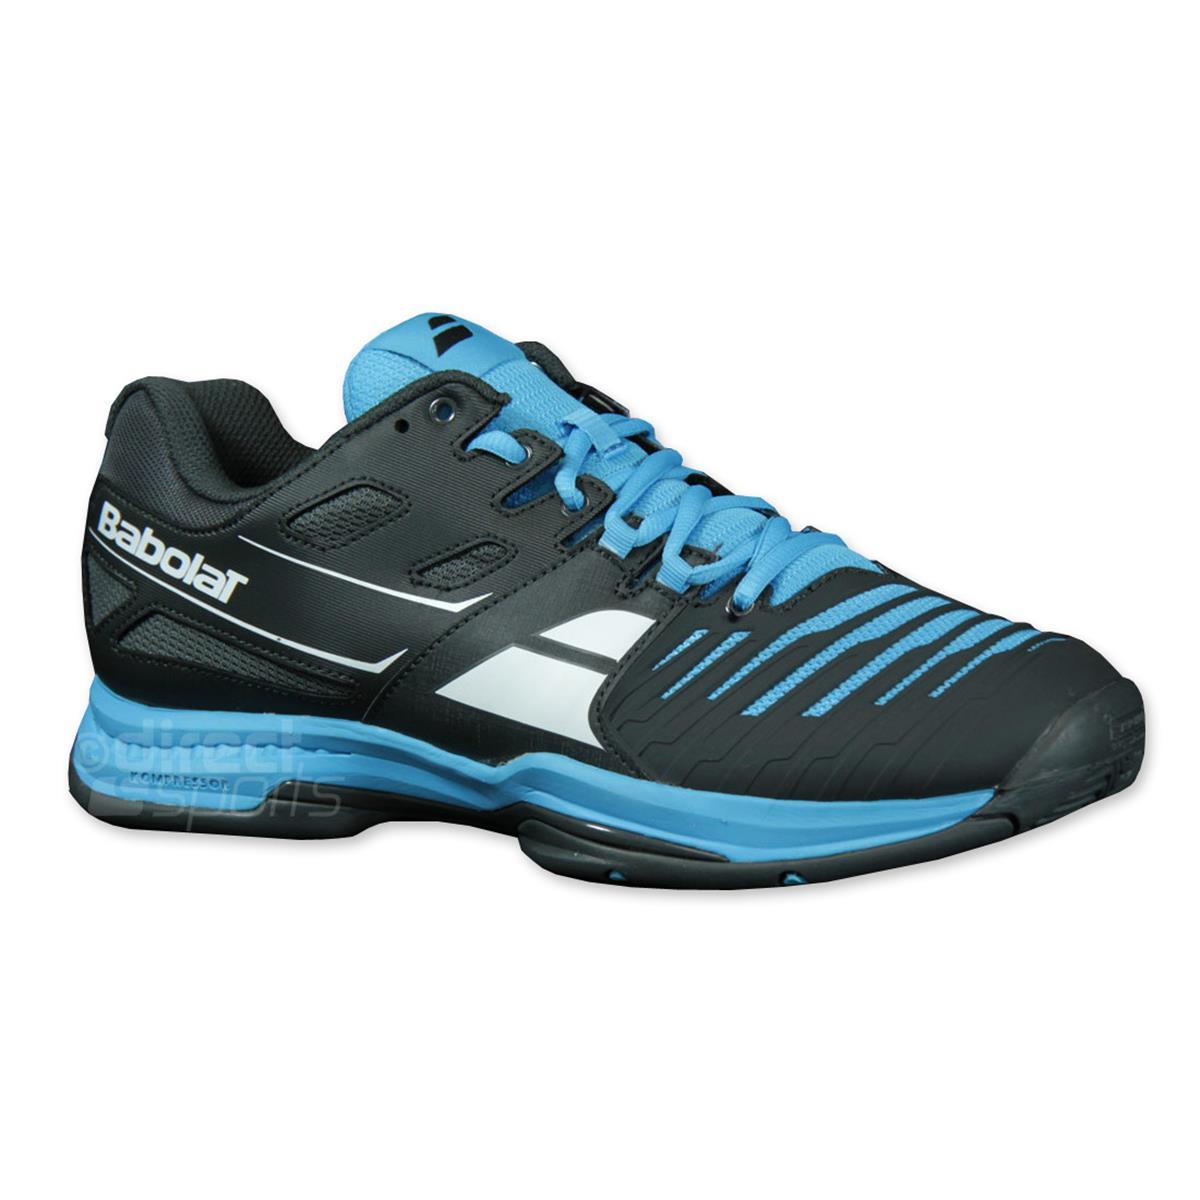 Babolat Sfx Tennis Shoes